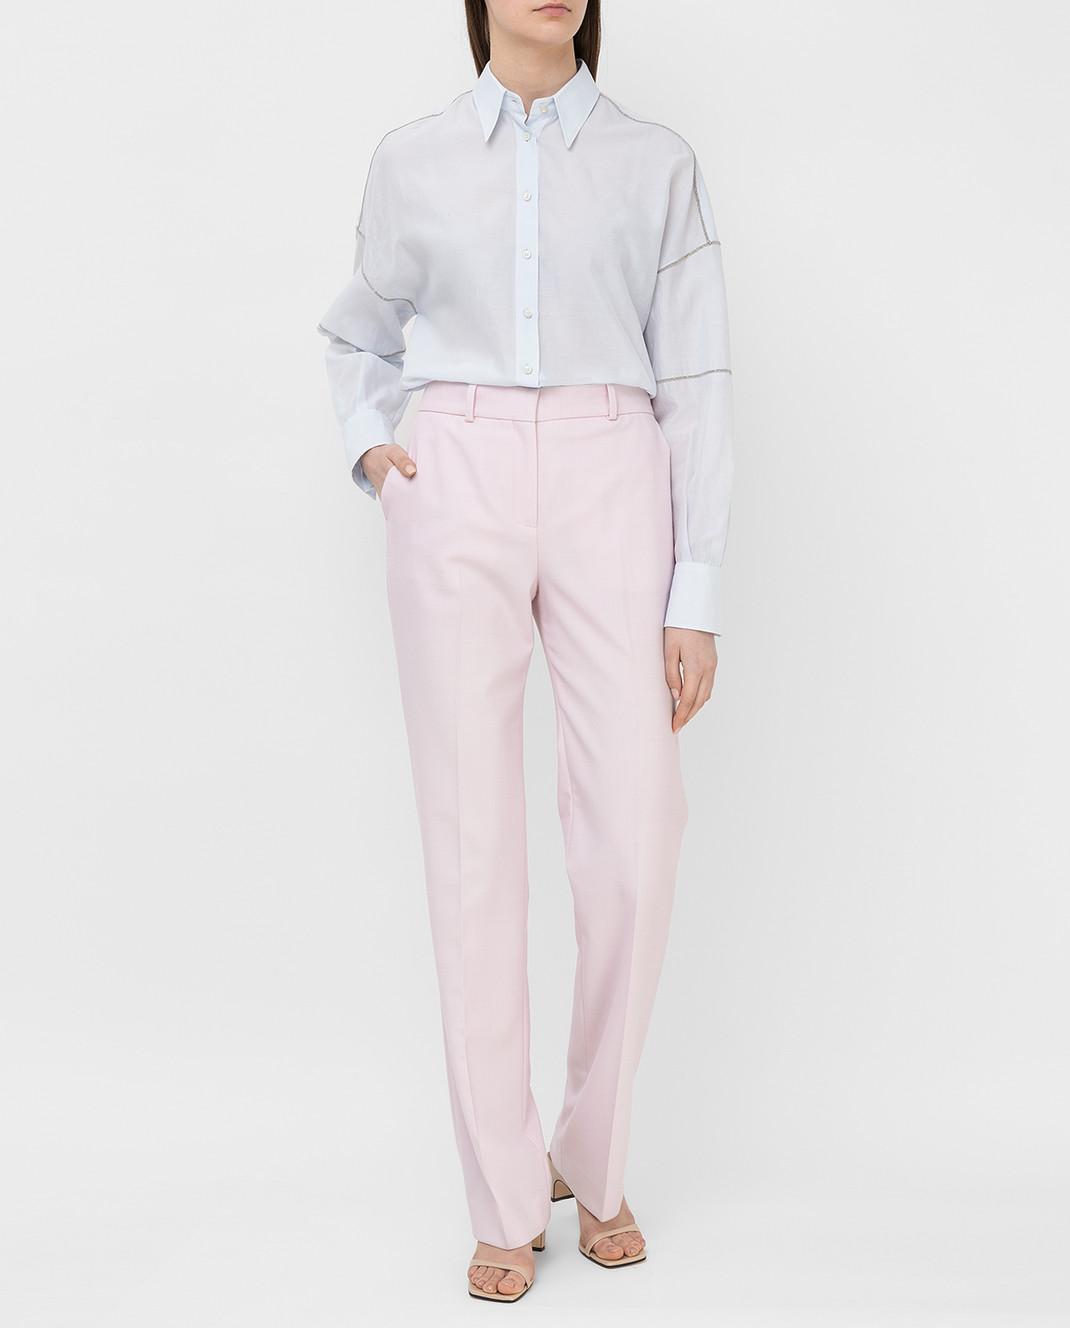 Victoria by Victoria Beckham Розовые брюки TRVV097 изображение 2